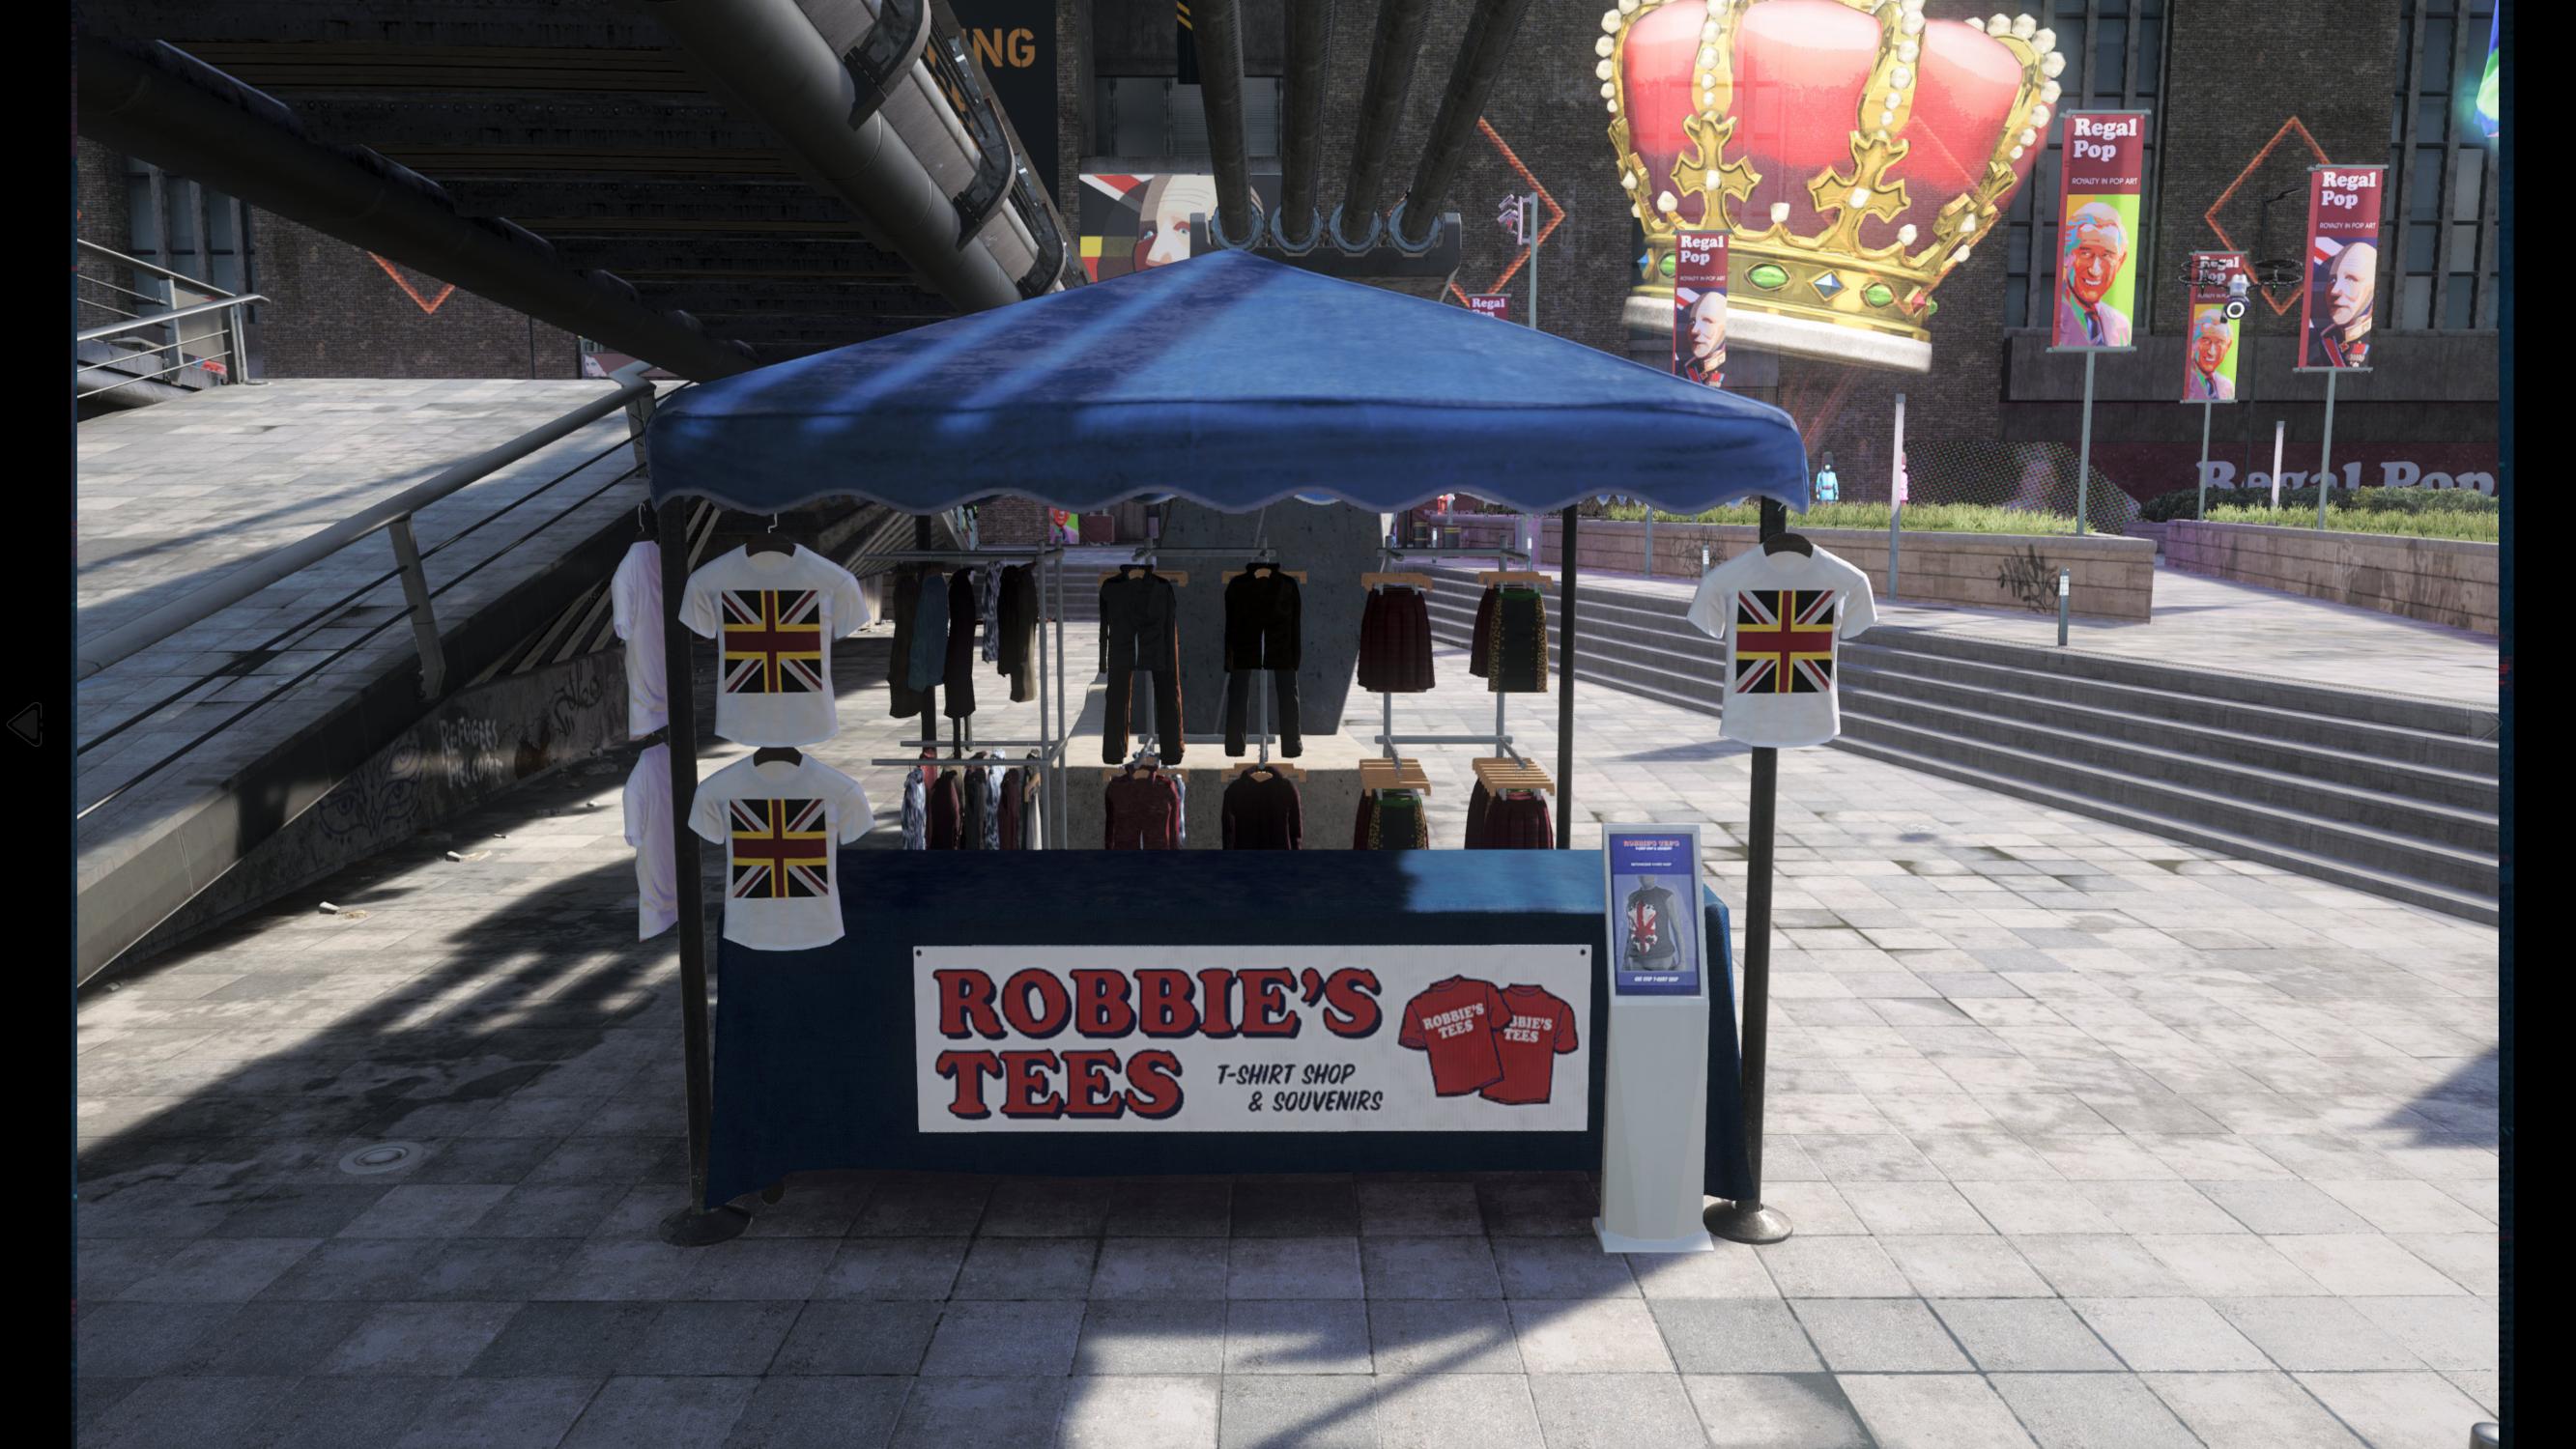 ROBBIE'S TEE'S